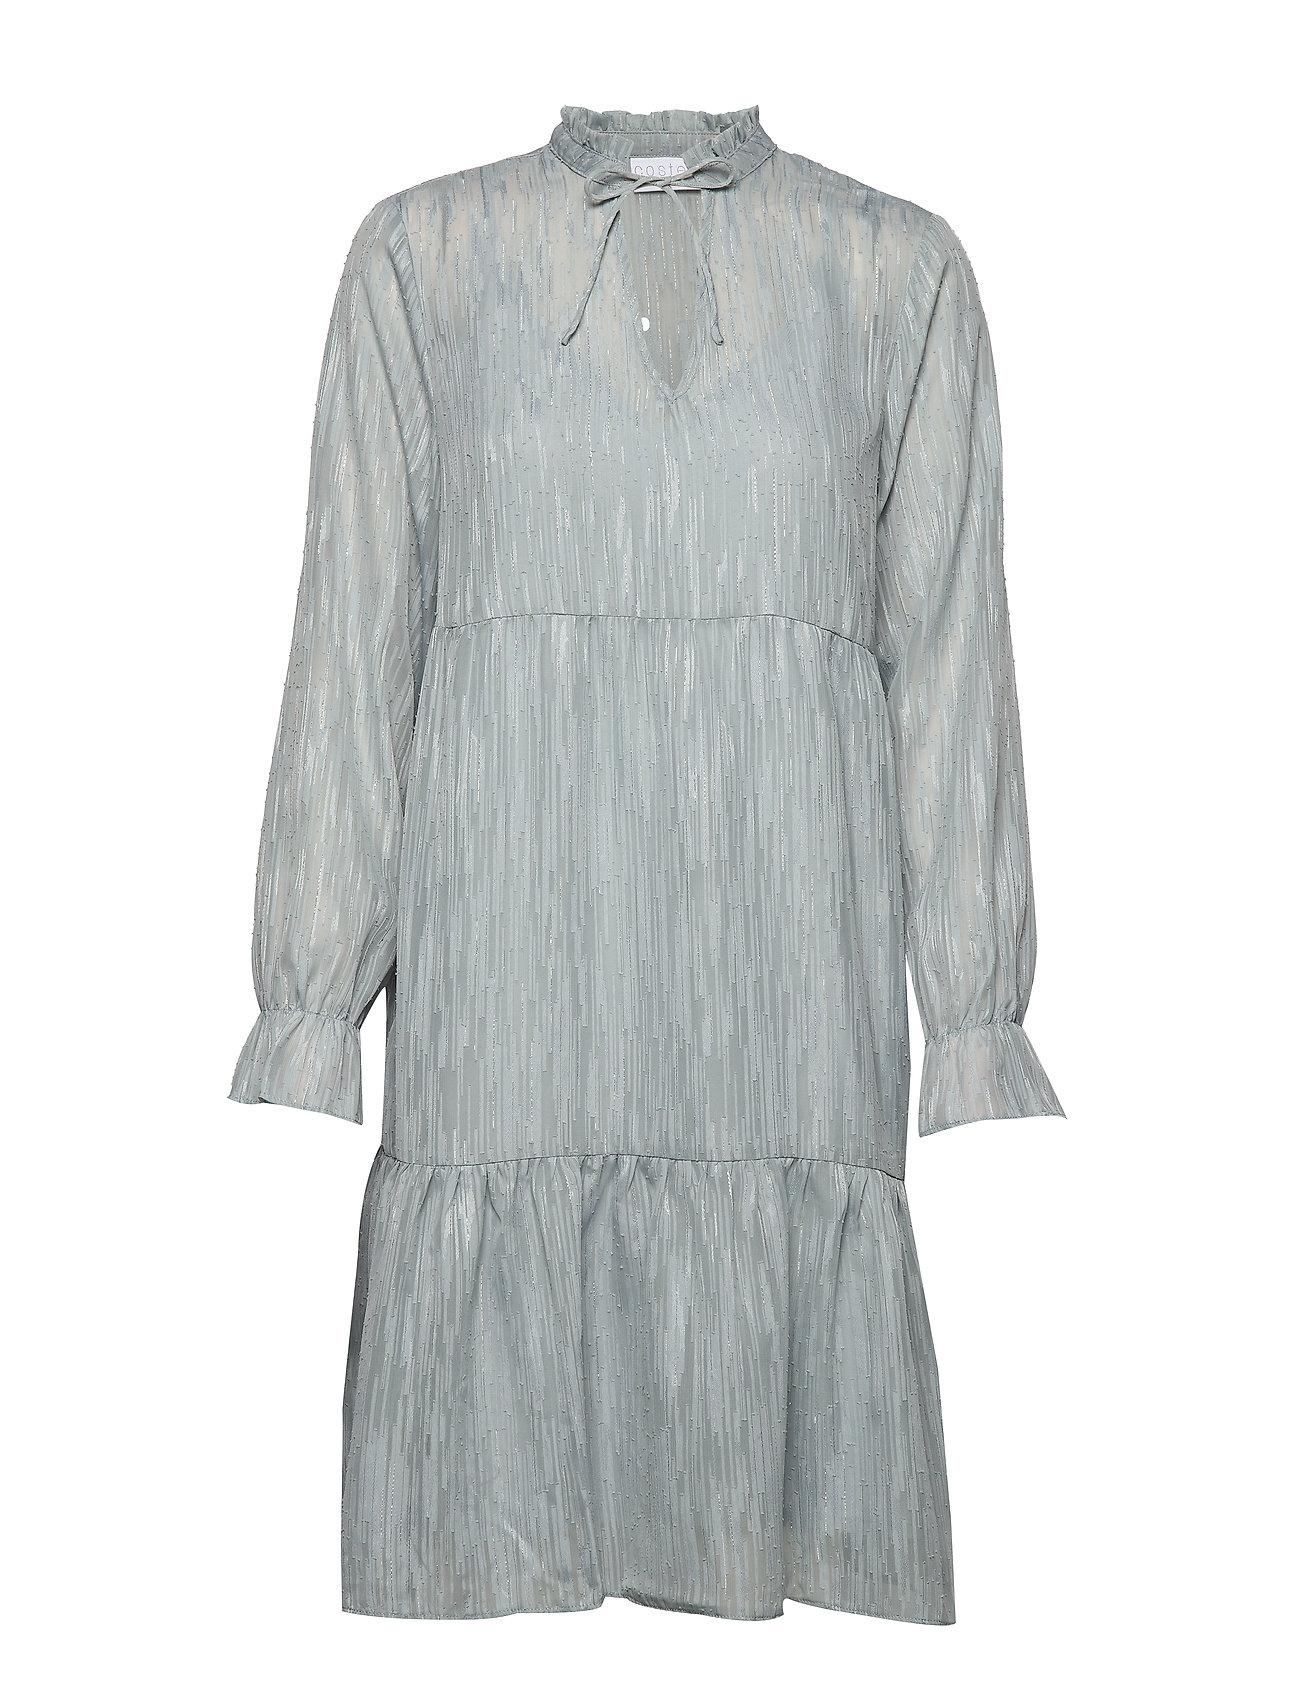 Coster Copenhagen Dress long sleeved w. frill at neck - SHADOW BLUE